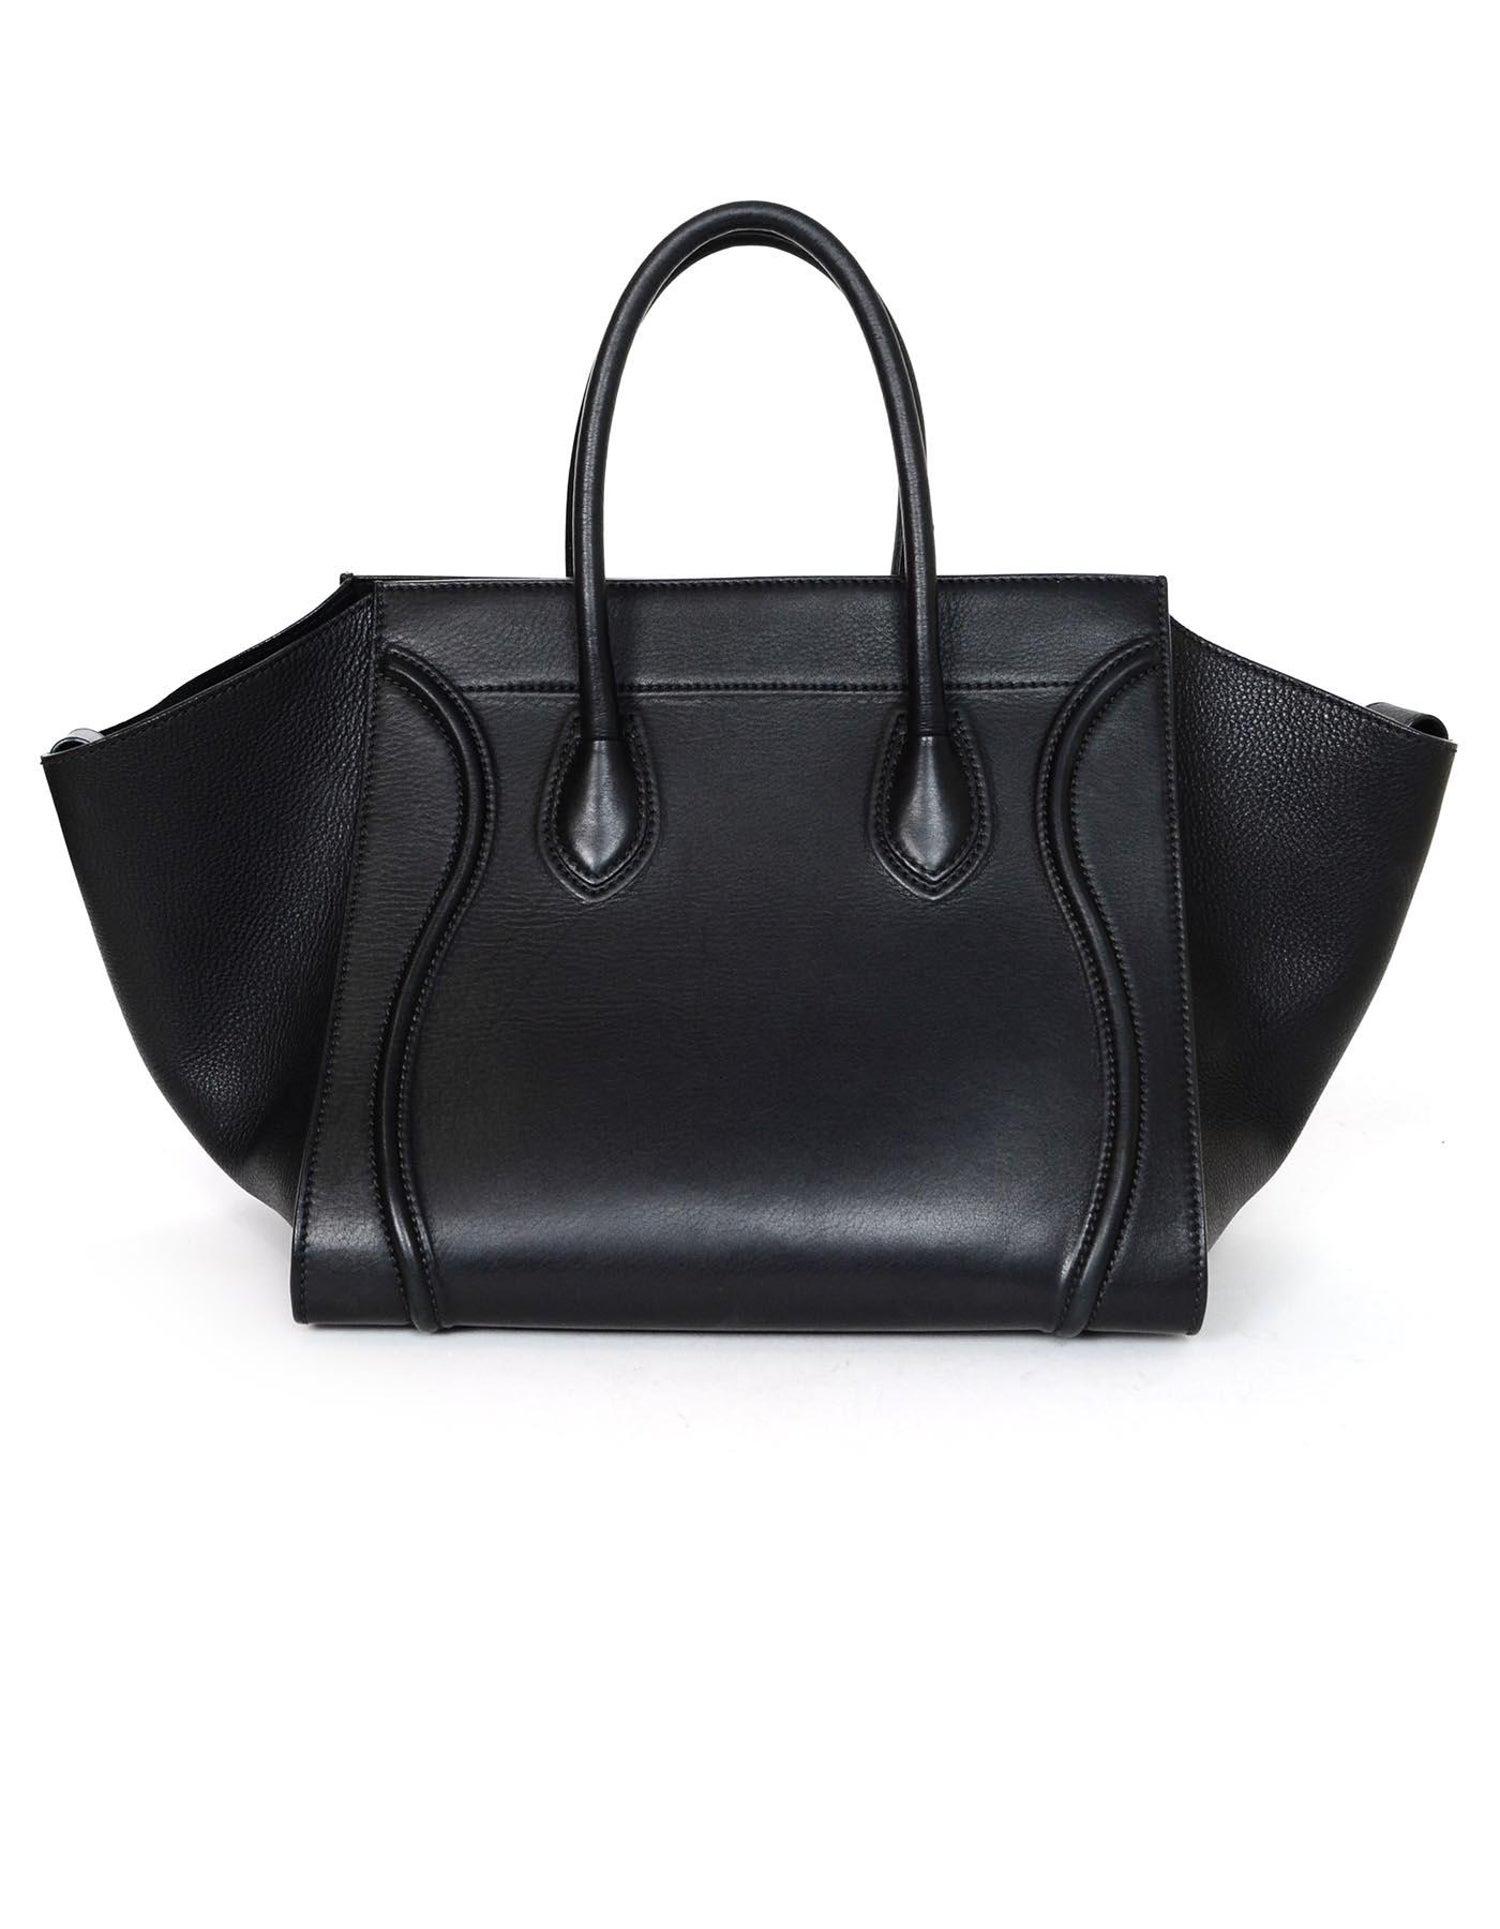 8069525b2b98 Celine Drummed Calfskin Leather Black Medium Phantom Luggage Tote Bag For  Sale at 1stdibs